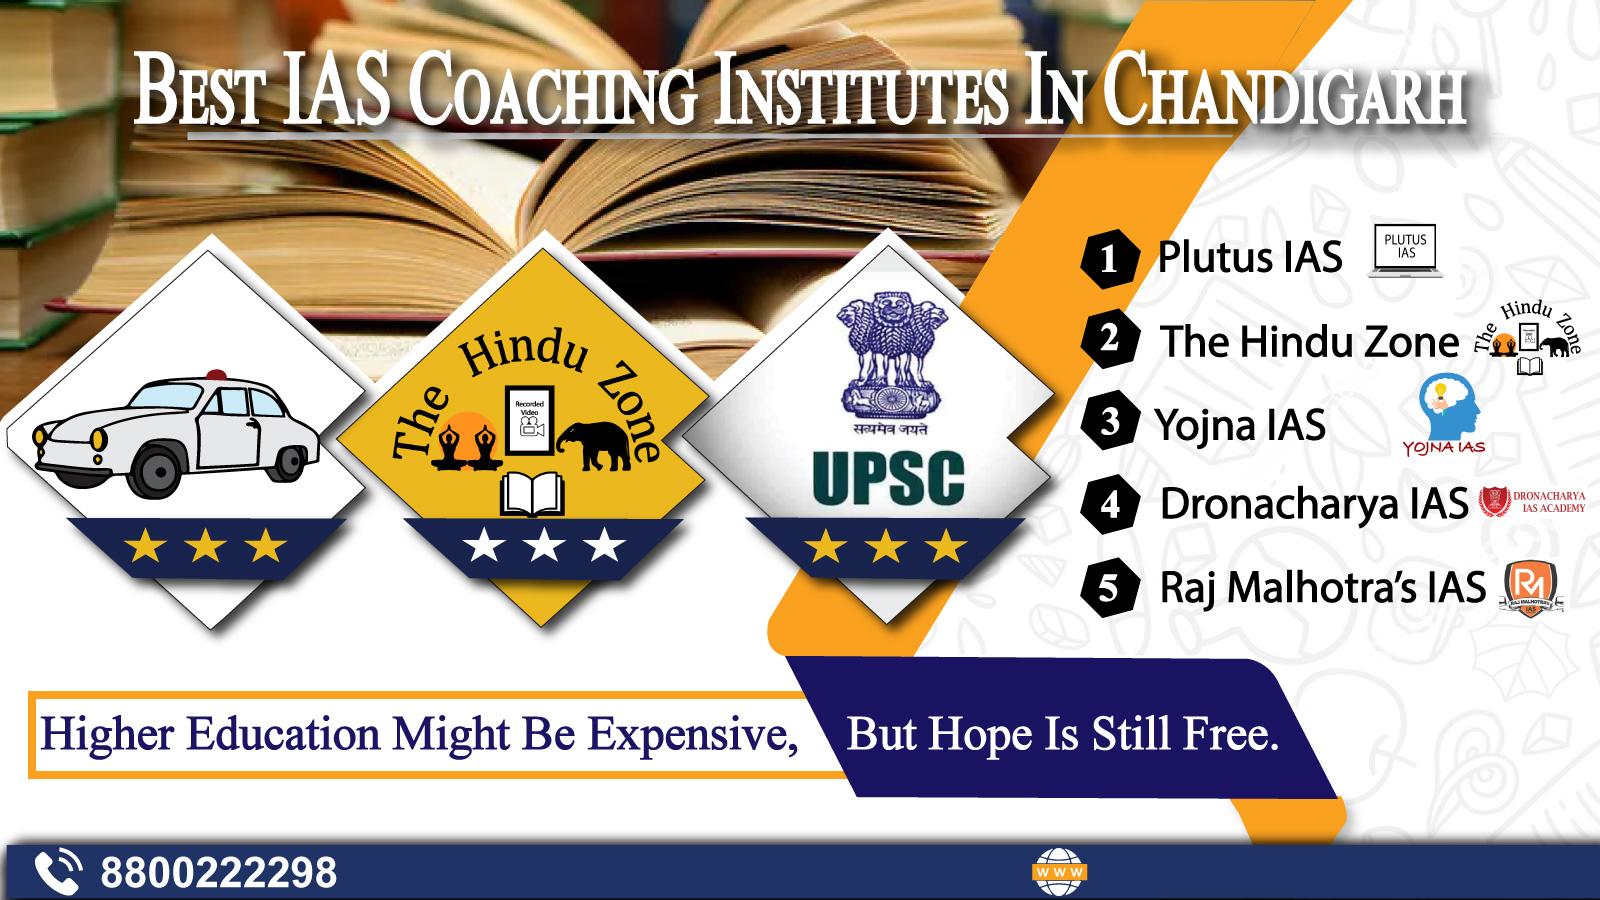 Top IAS Coaching Institutes In Chandigarh